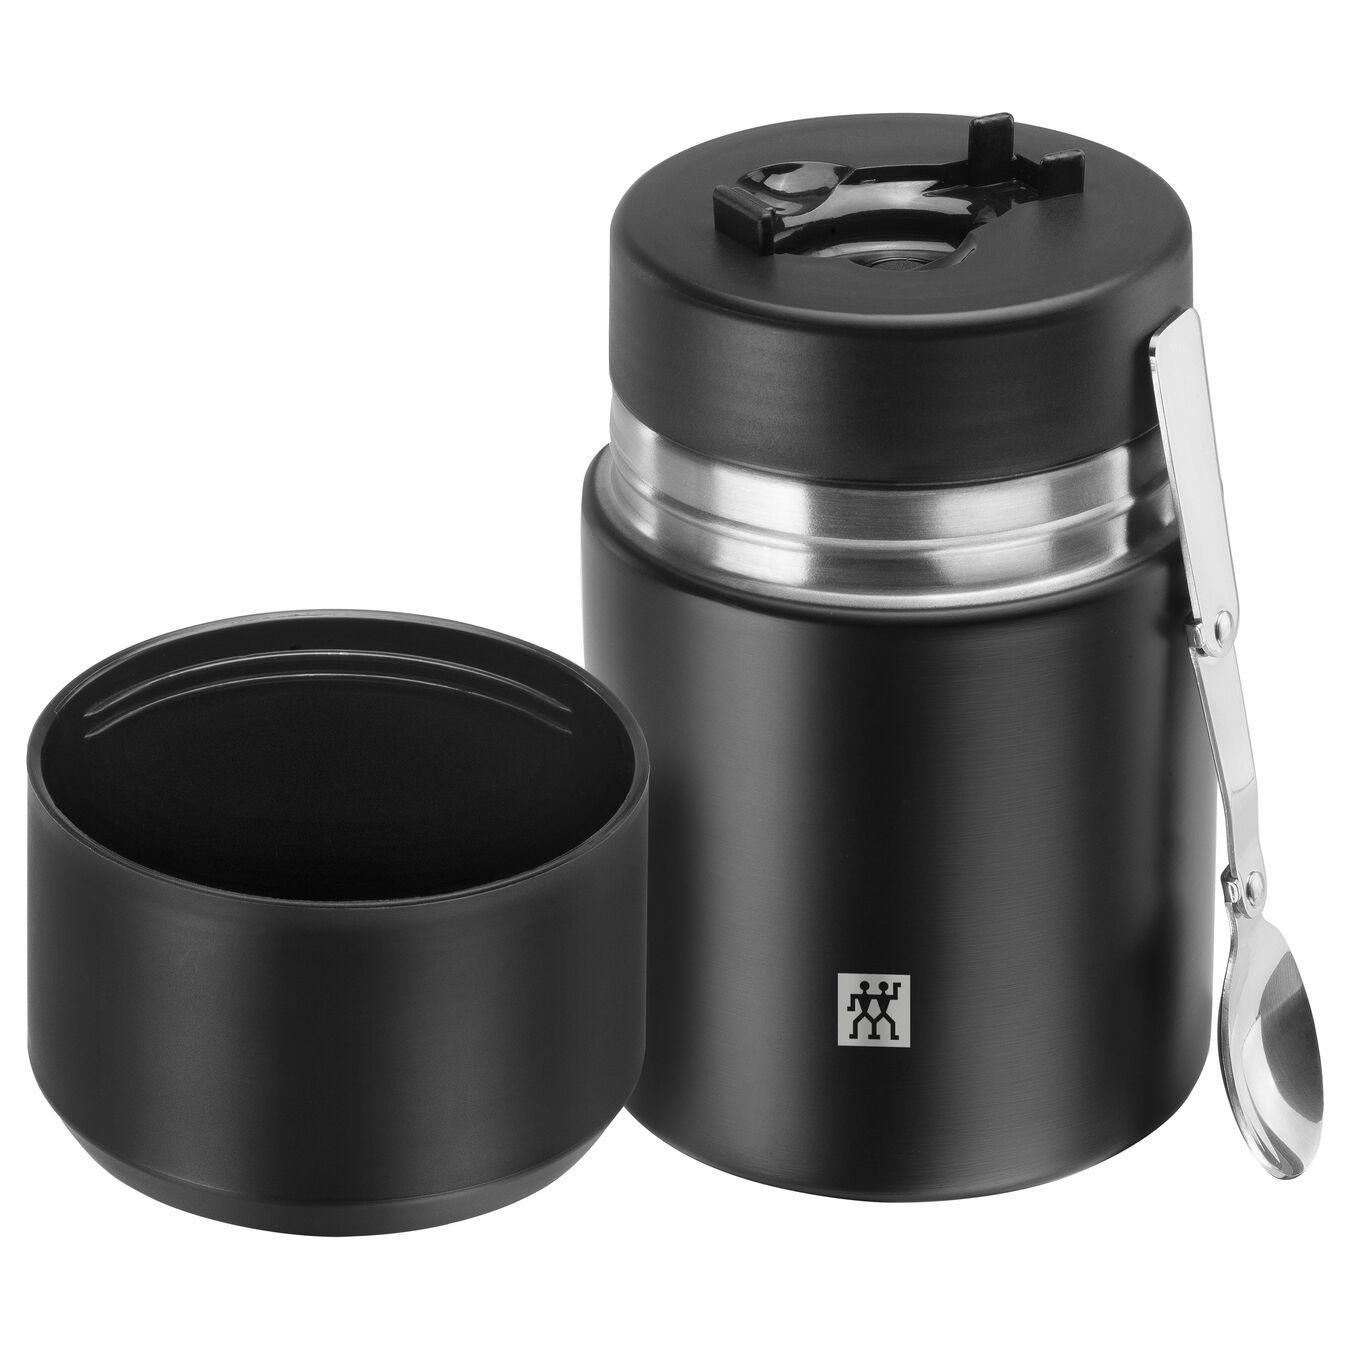 Recipiente alimentare - 700 ml, acciaio inox, nero,,large 3